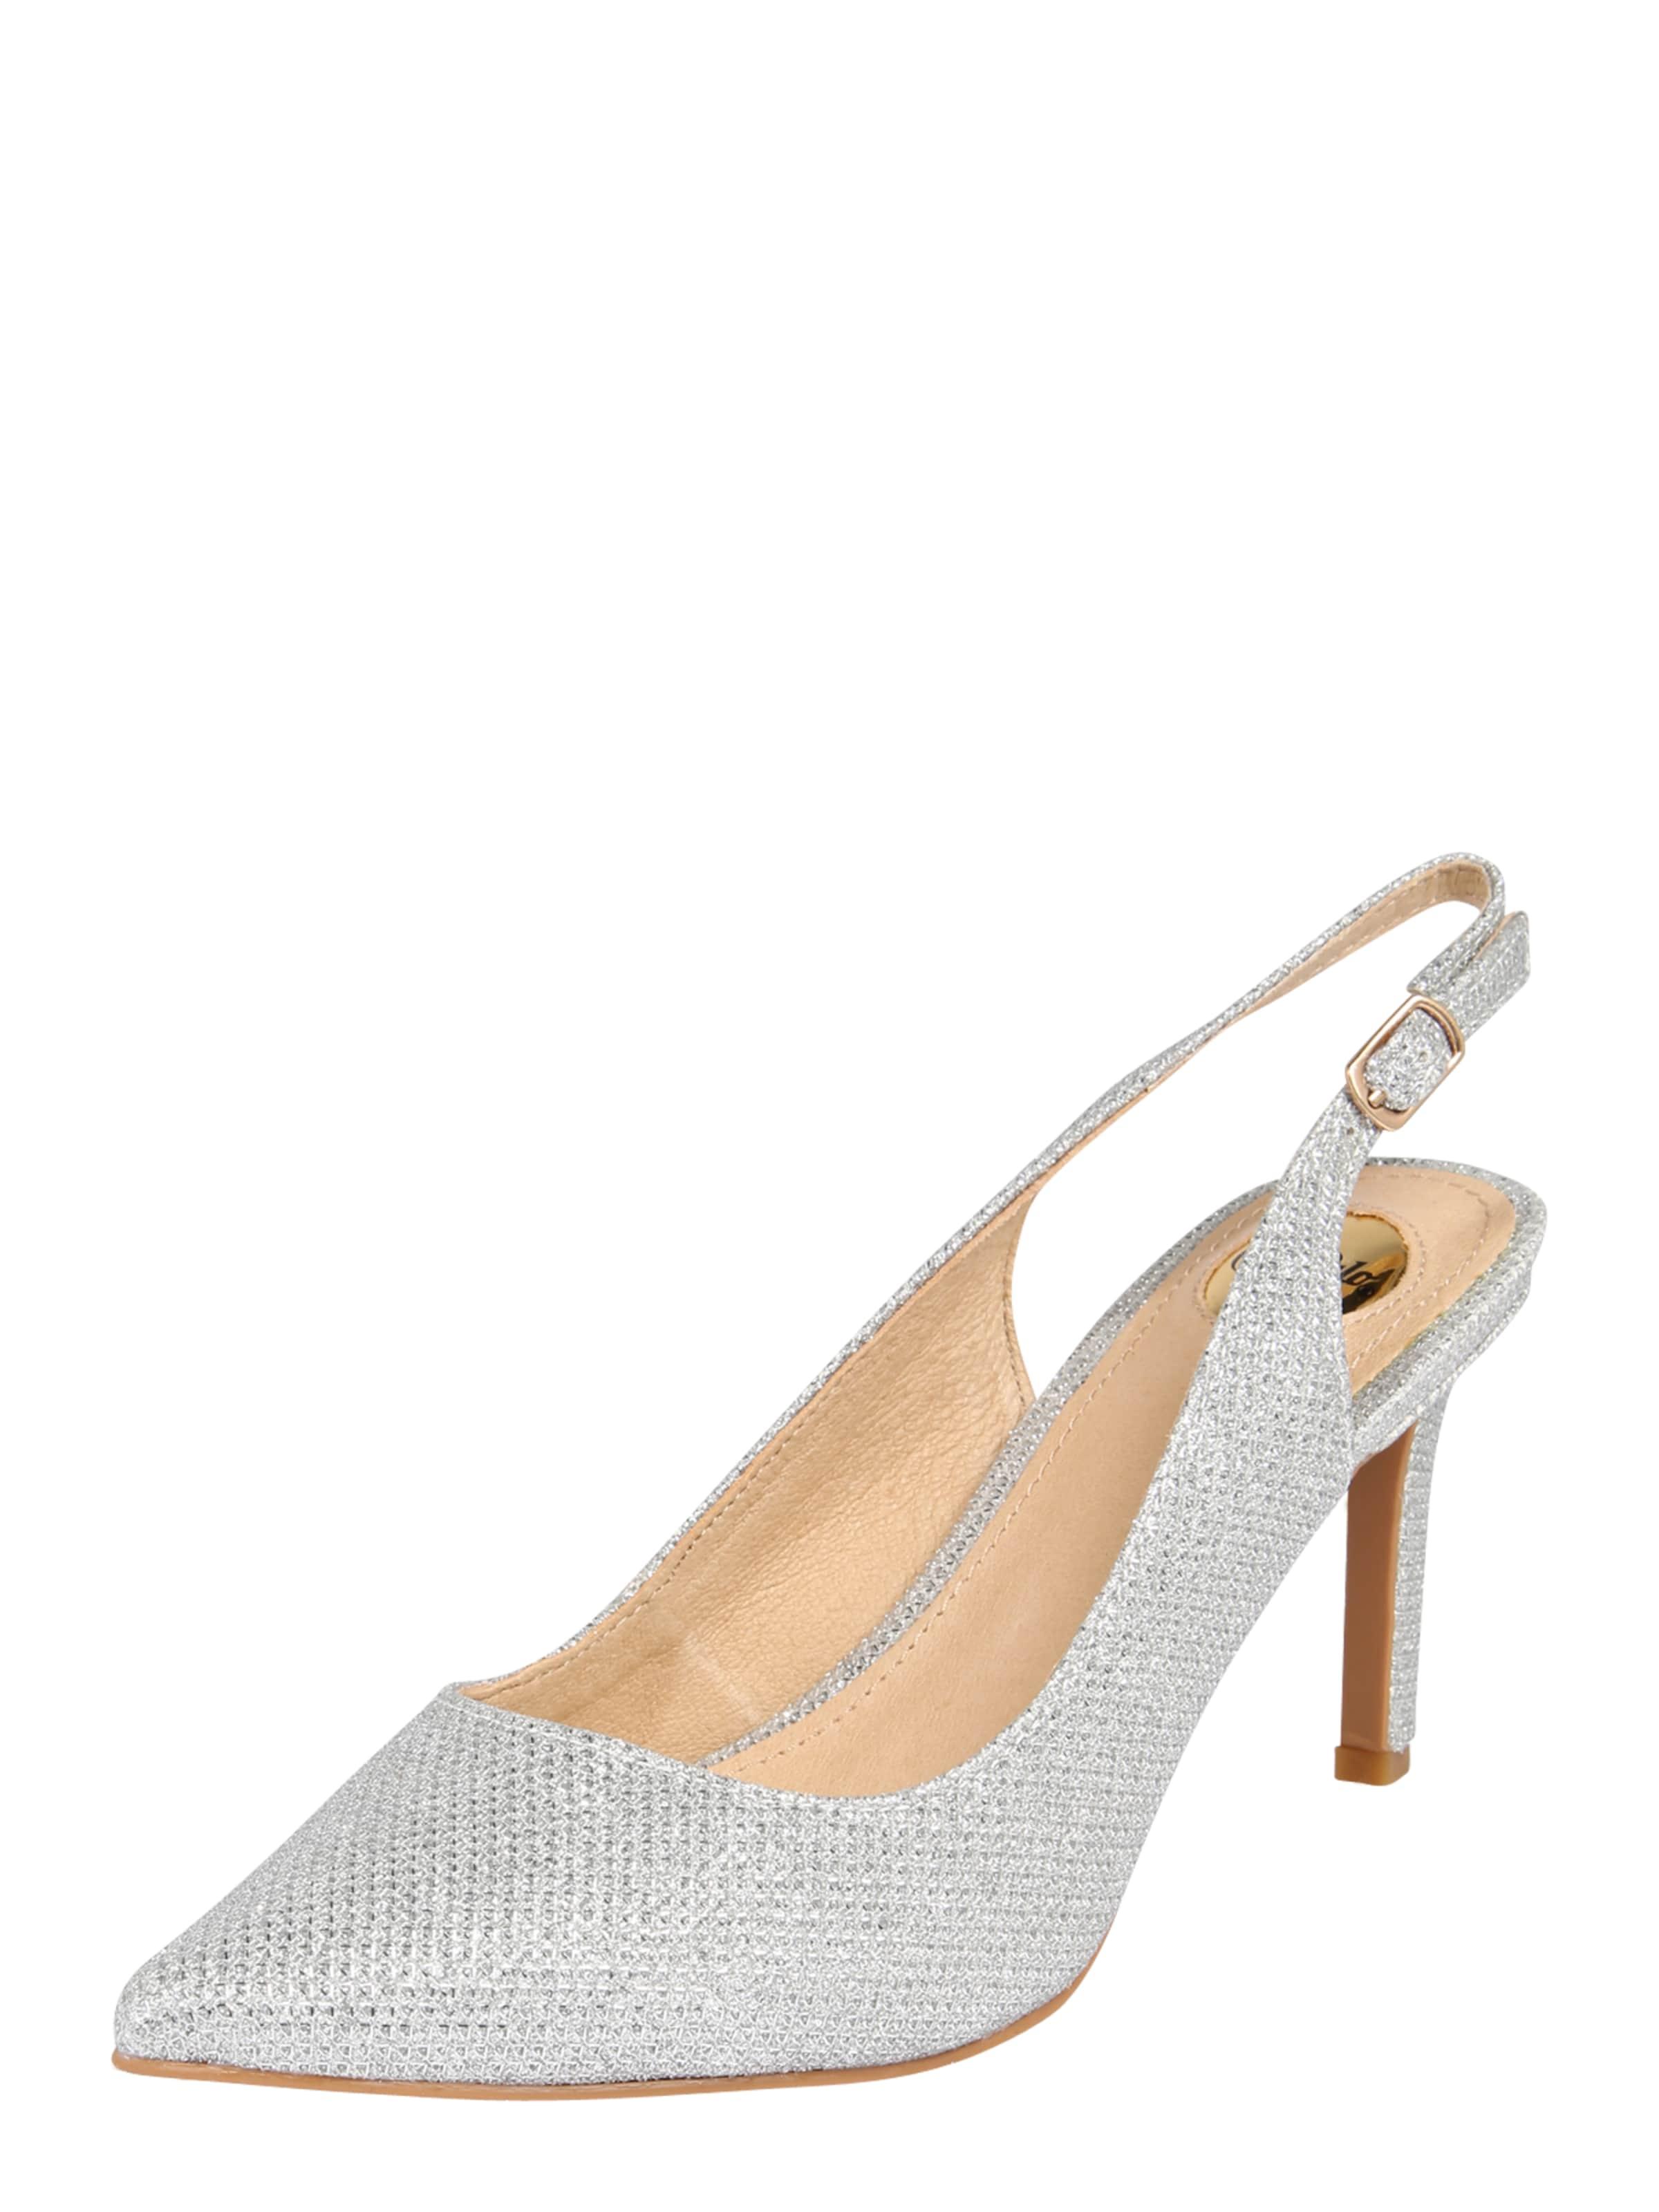 BUFFALO Sling-Pumps Günstige und langlebige Schuhe